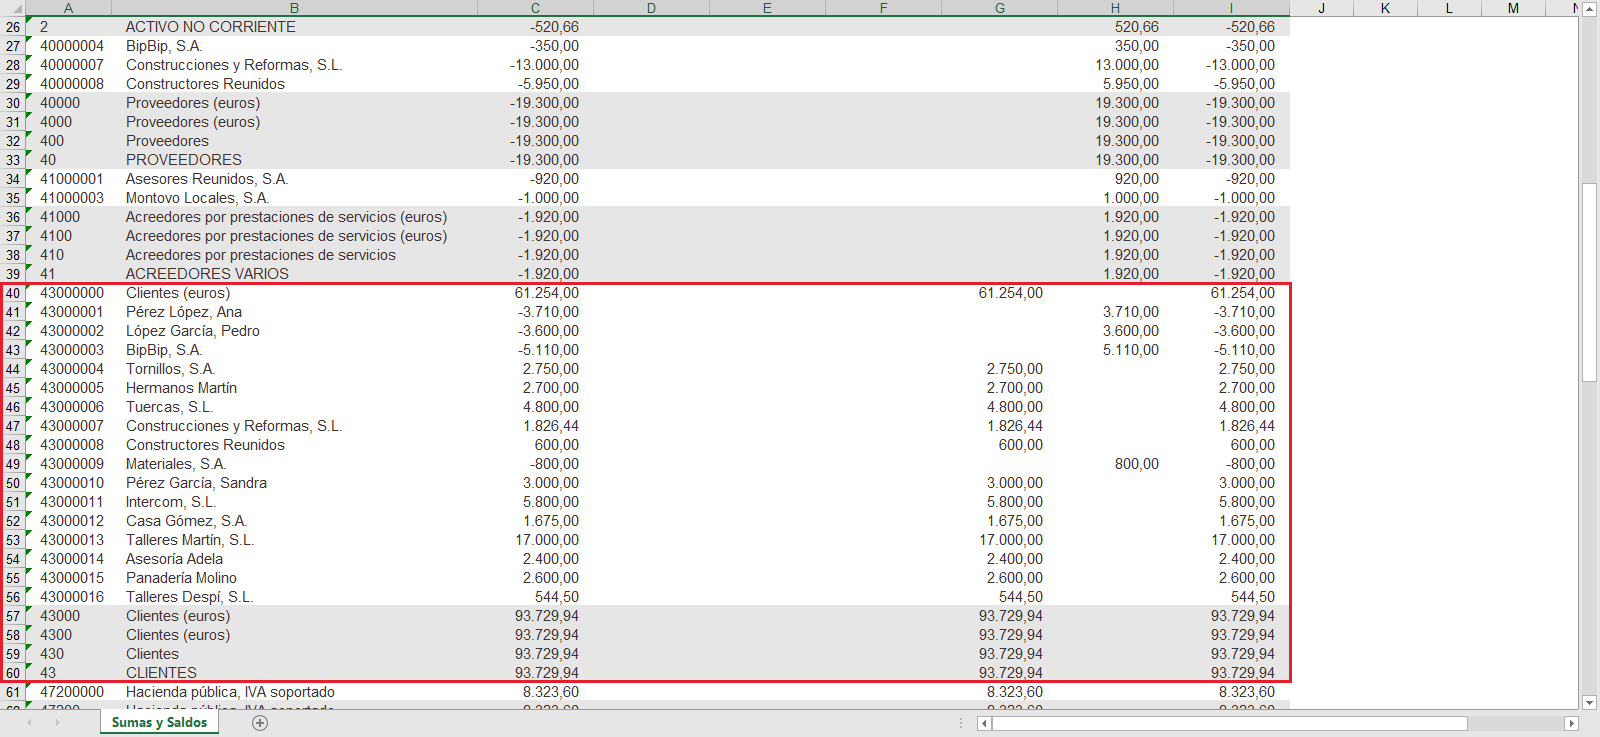 Balance_SyS_Totalizando_por_niveles_Excel